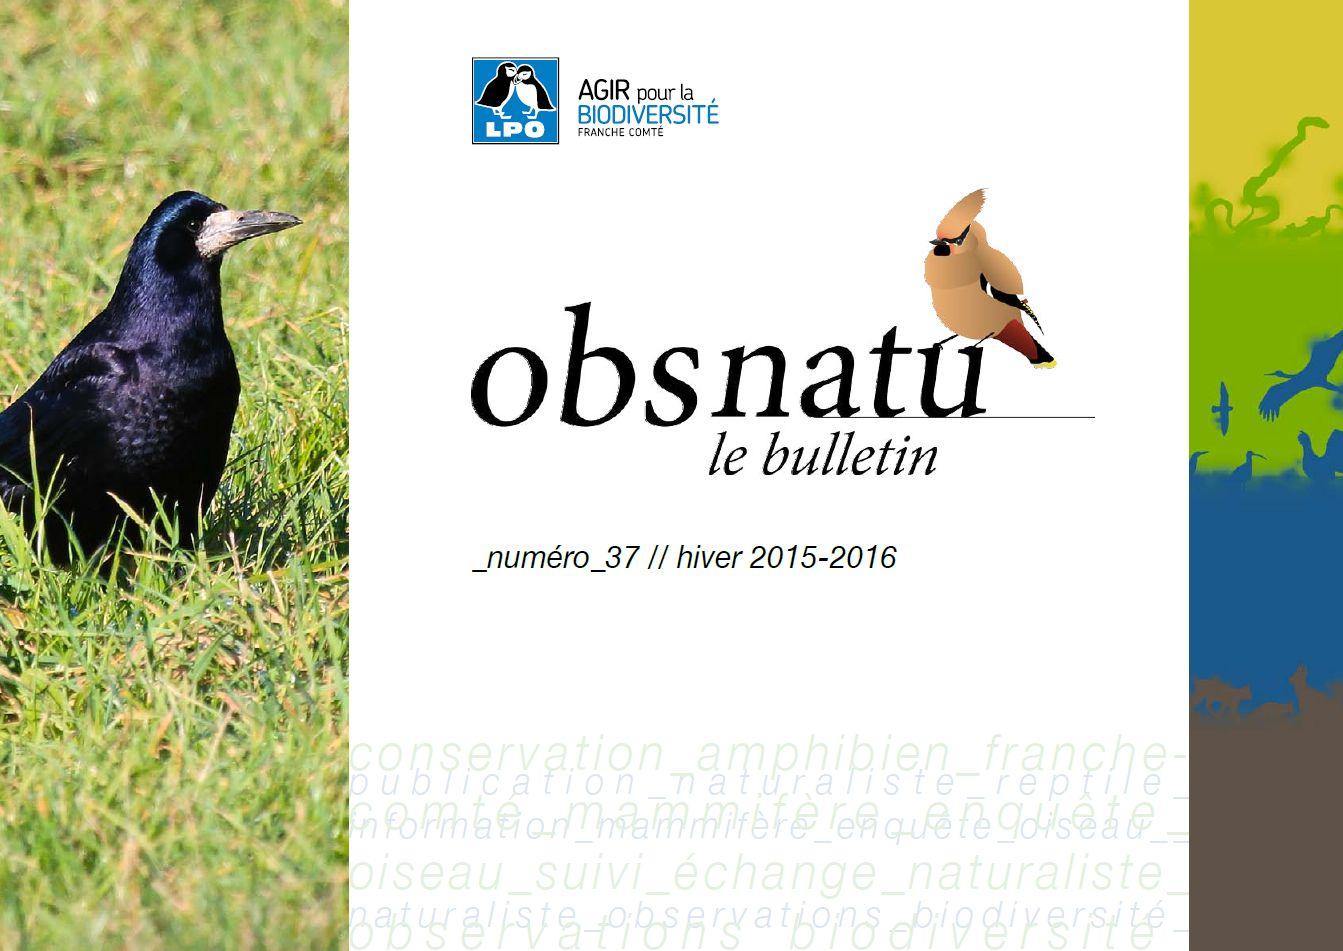 https://cdnfiles1.biolovision.net/franche-comte.lpo.fr/userfiles/publications/Obsnatubulls/Obsnatun37hiv2015couv.jpg